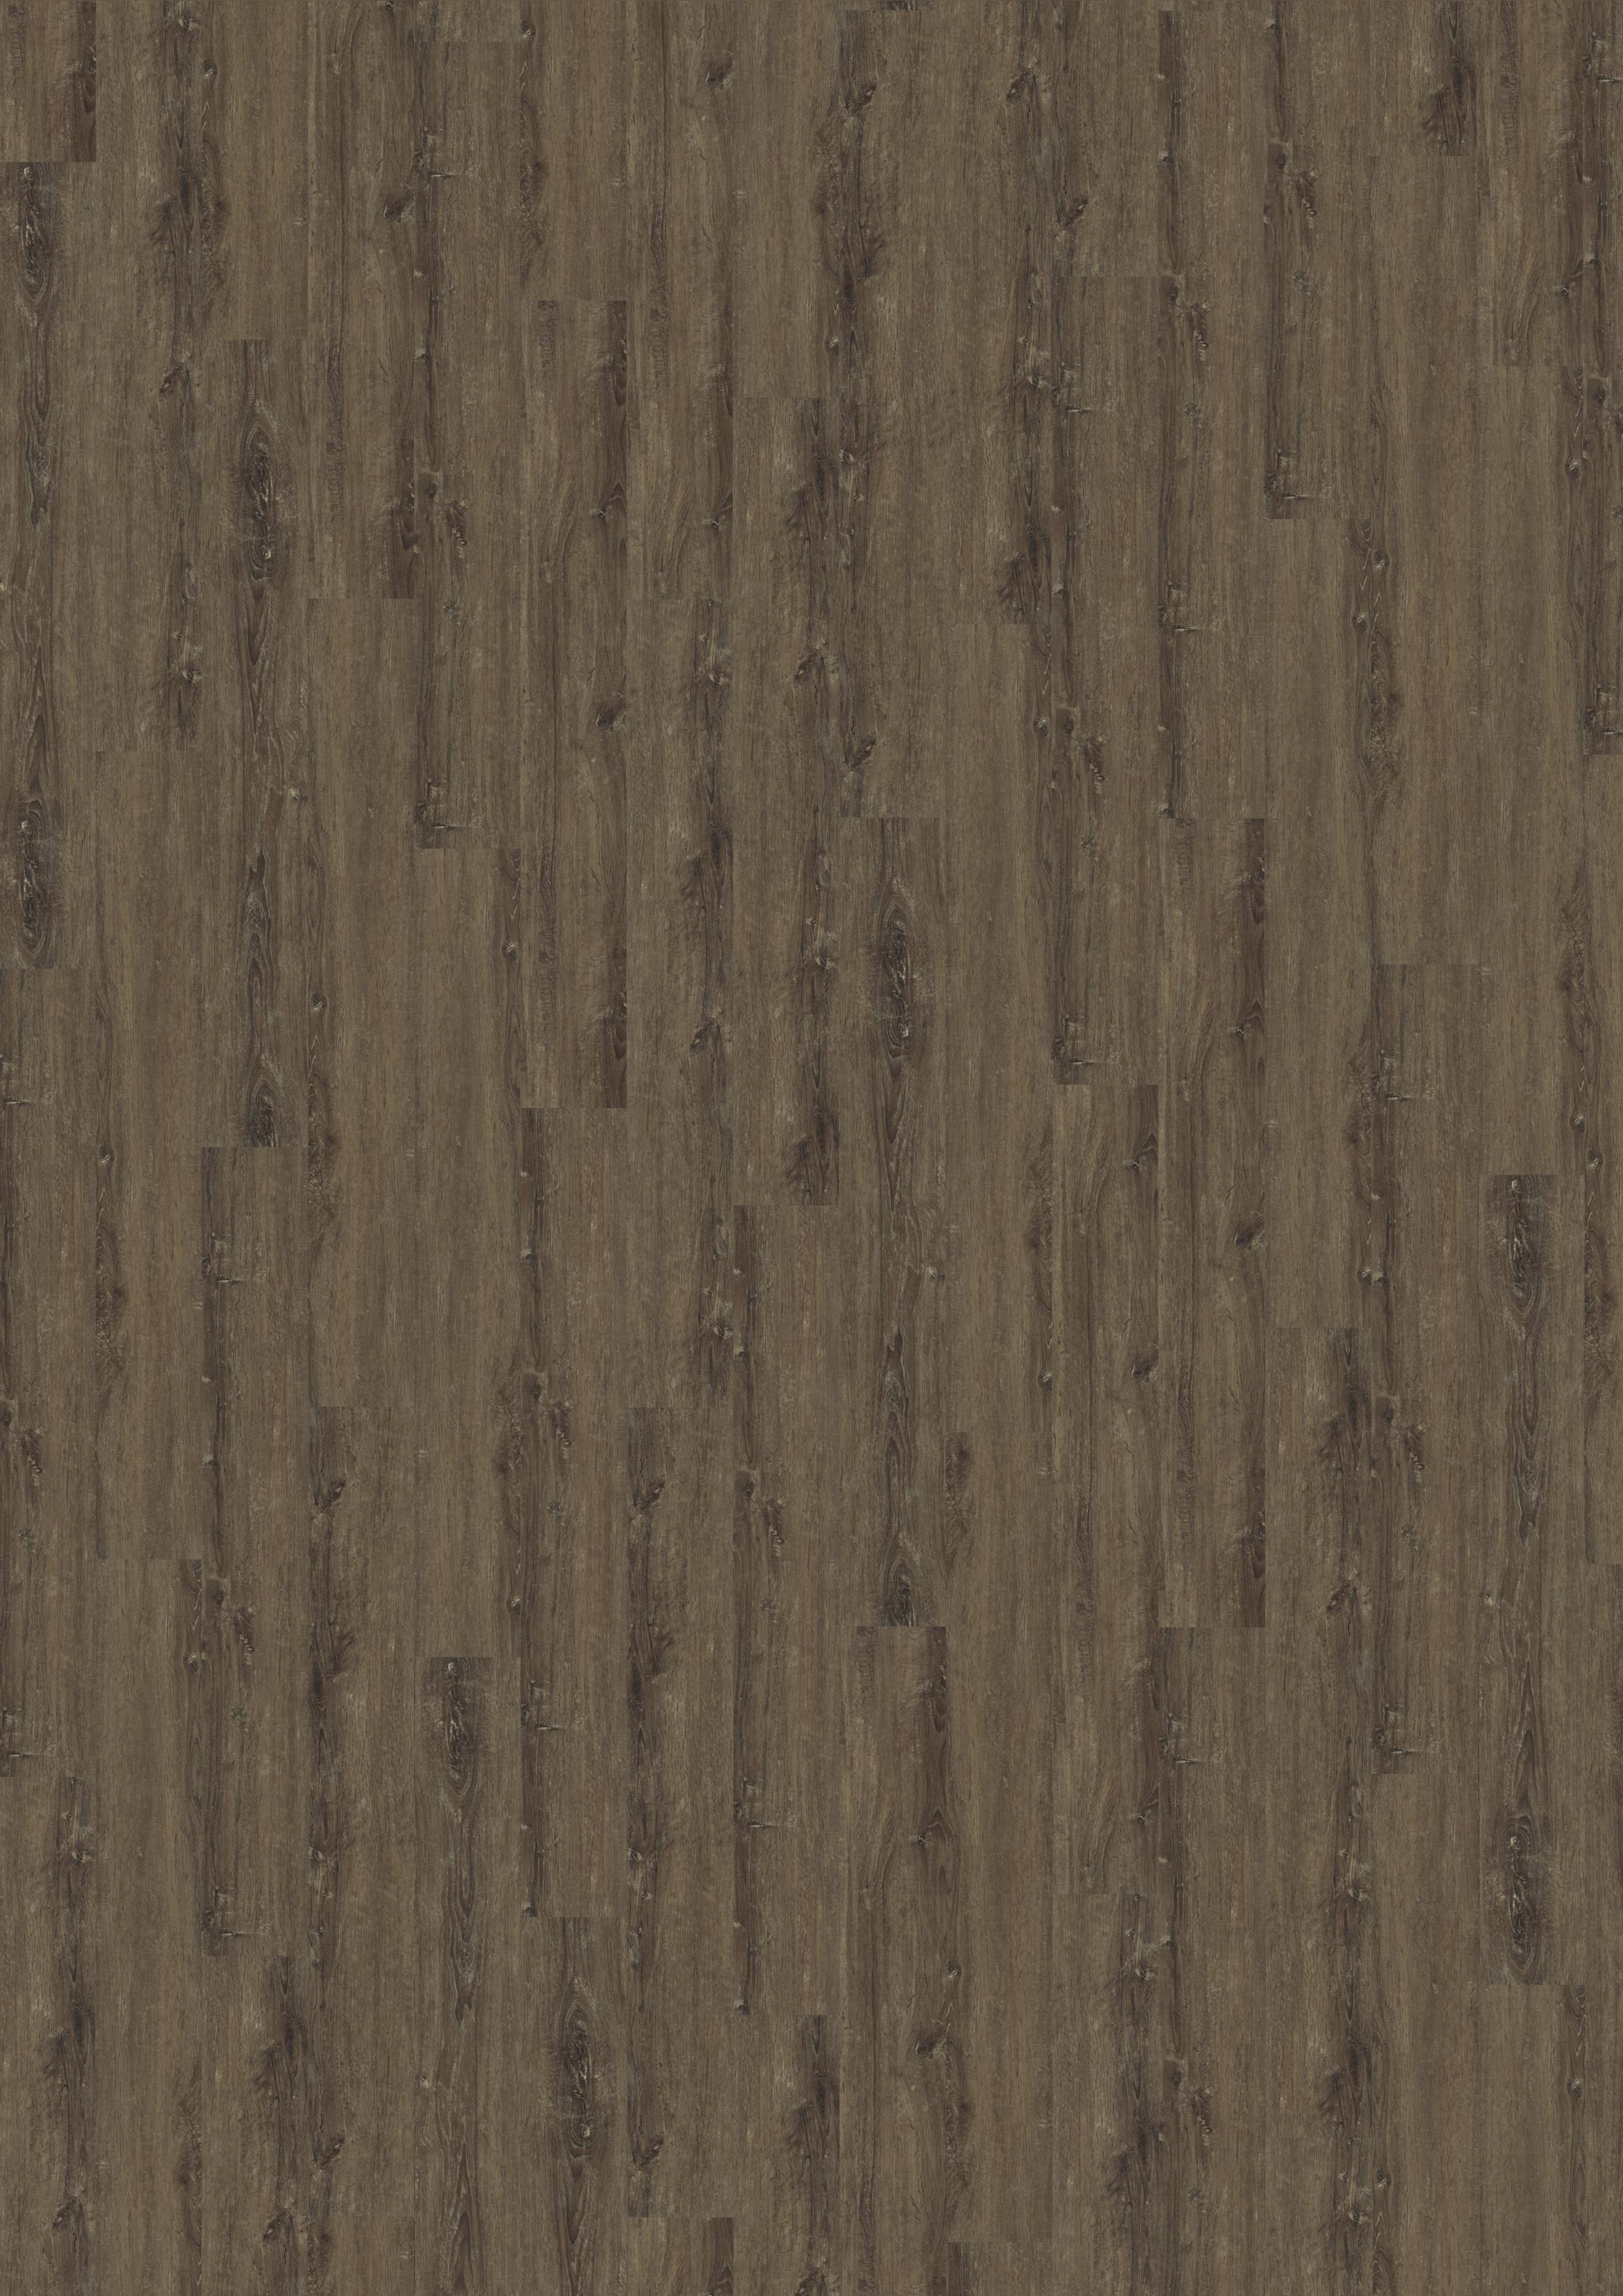 klick vinyl muster klick vinyl fliesen stone sardinien 0 55 mm klick klick vinyl kastanie. Black Bedroom Furniture Sets. Home Design Ideas